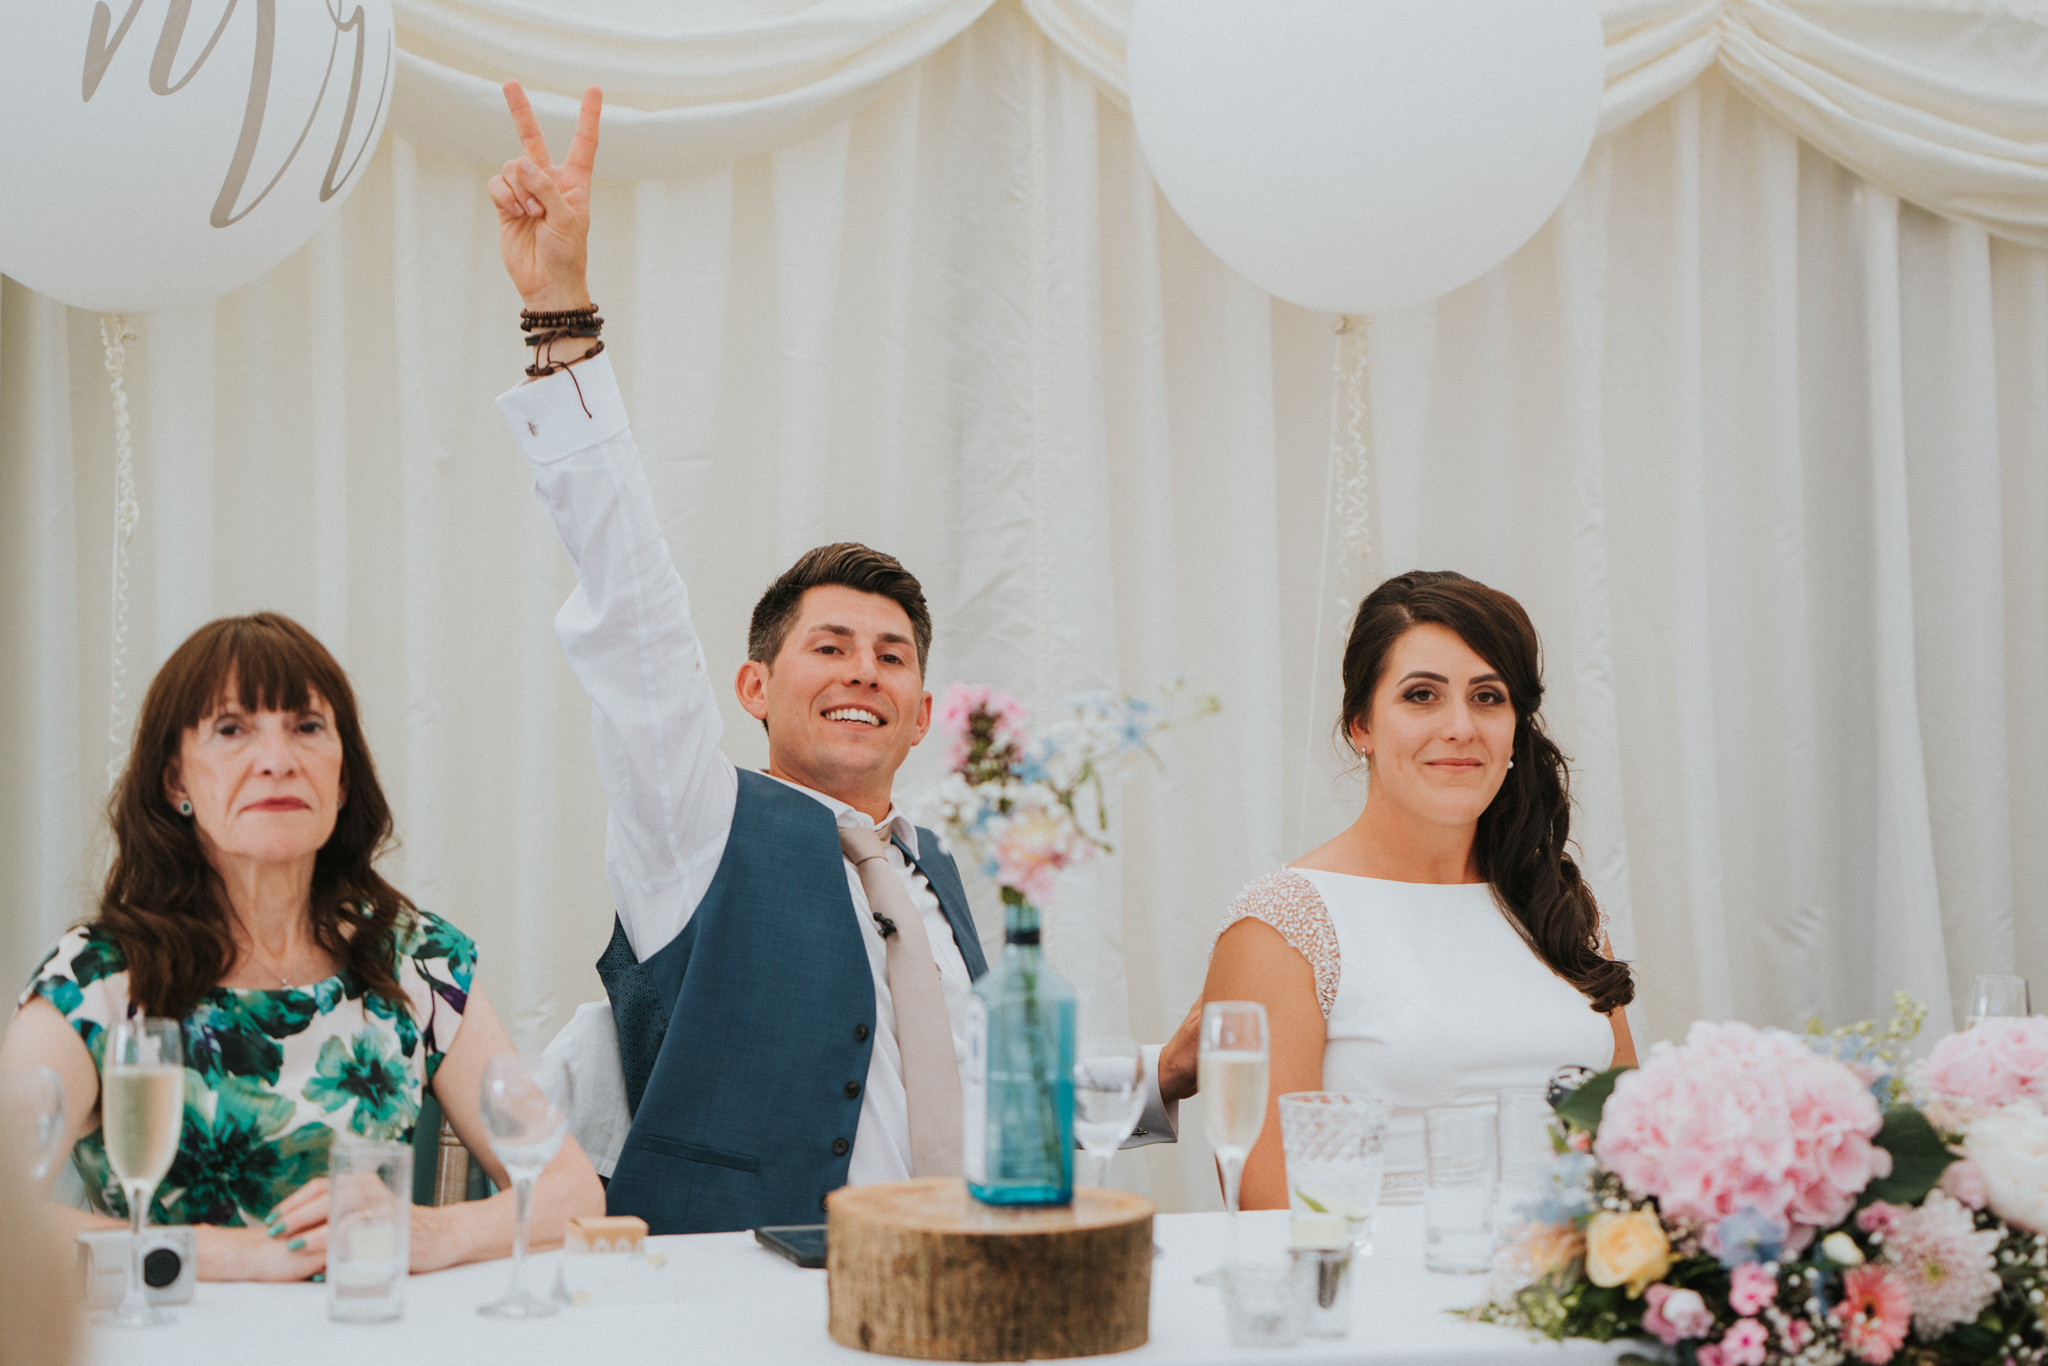 danielle-and-gareths-boho-wedding-previews-at-high-house-weddings-grace-elizabeth-colchester-essex-suffolk-norfolk-devon-alternative-wedding-and-lifestyle-photographer (57 of 76).jpg